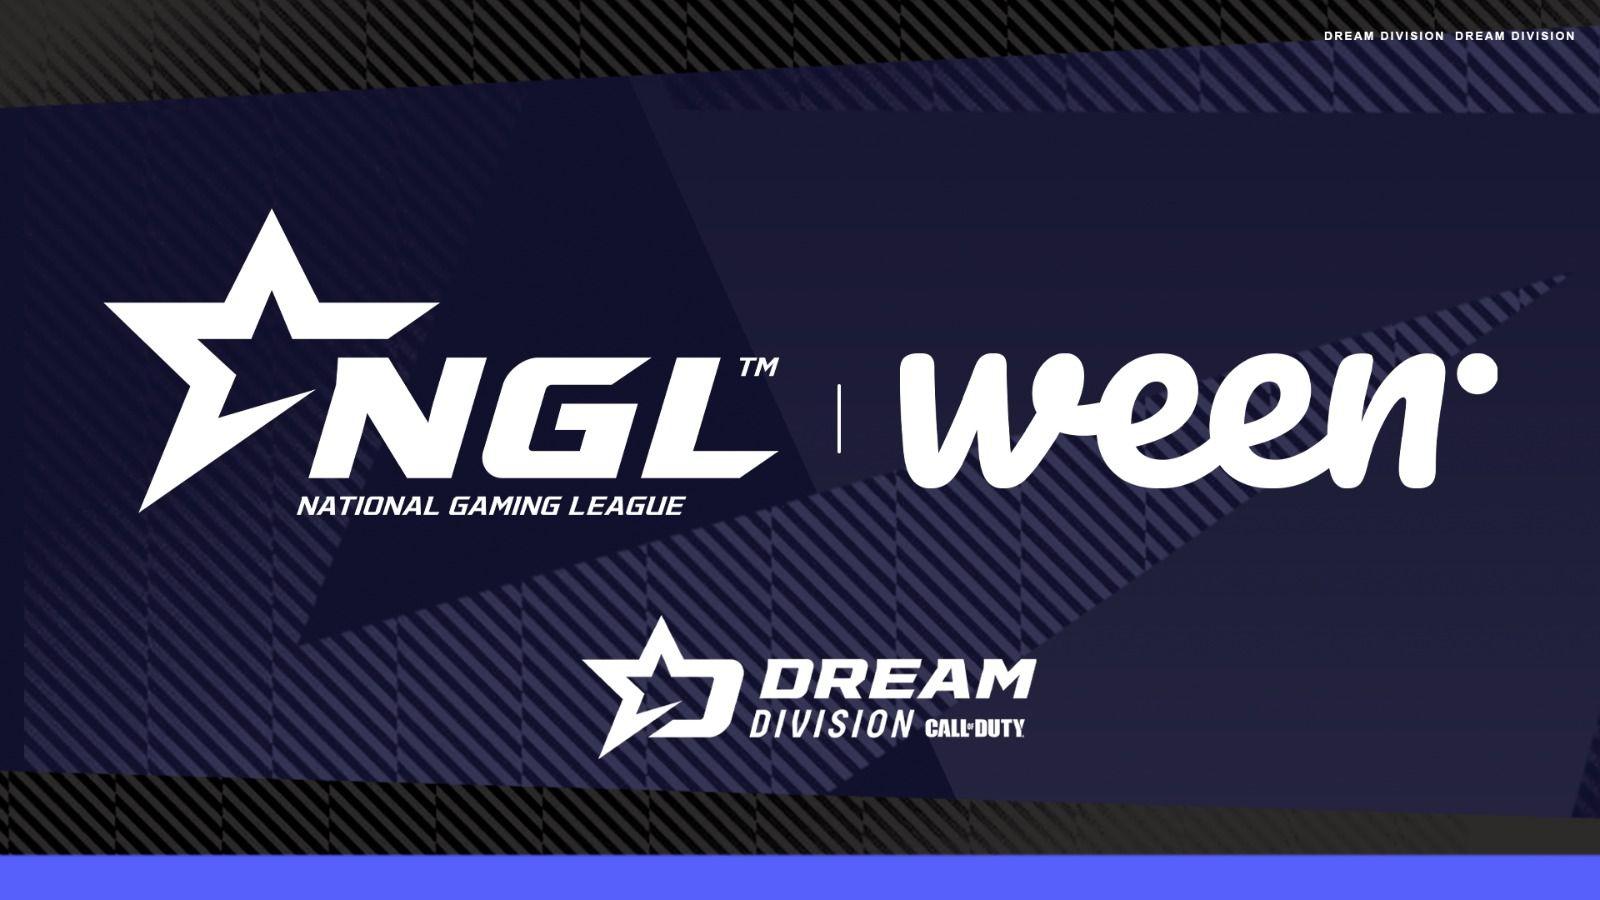 National Gaming League confía en Ween como plataforma para Dream Division